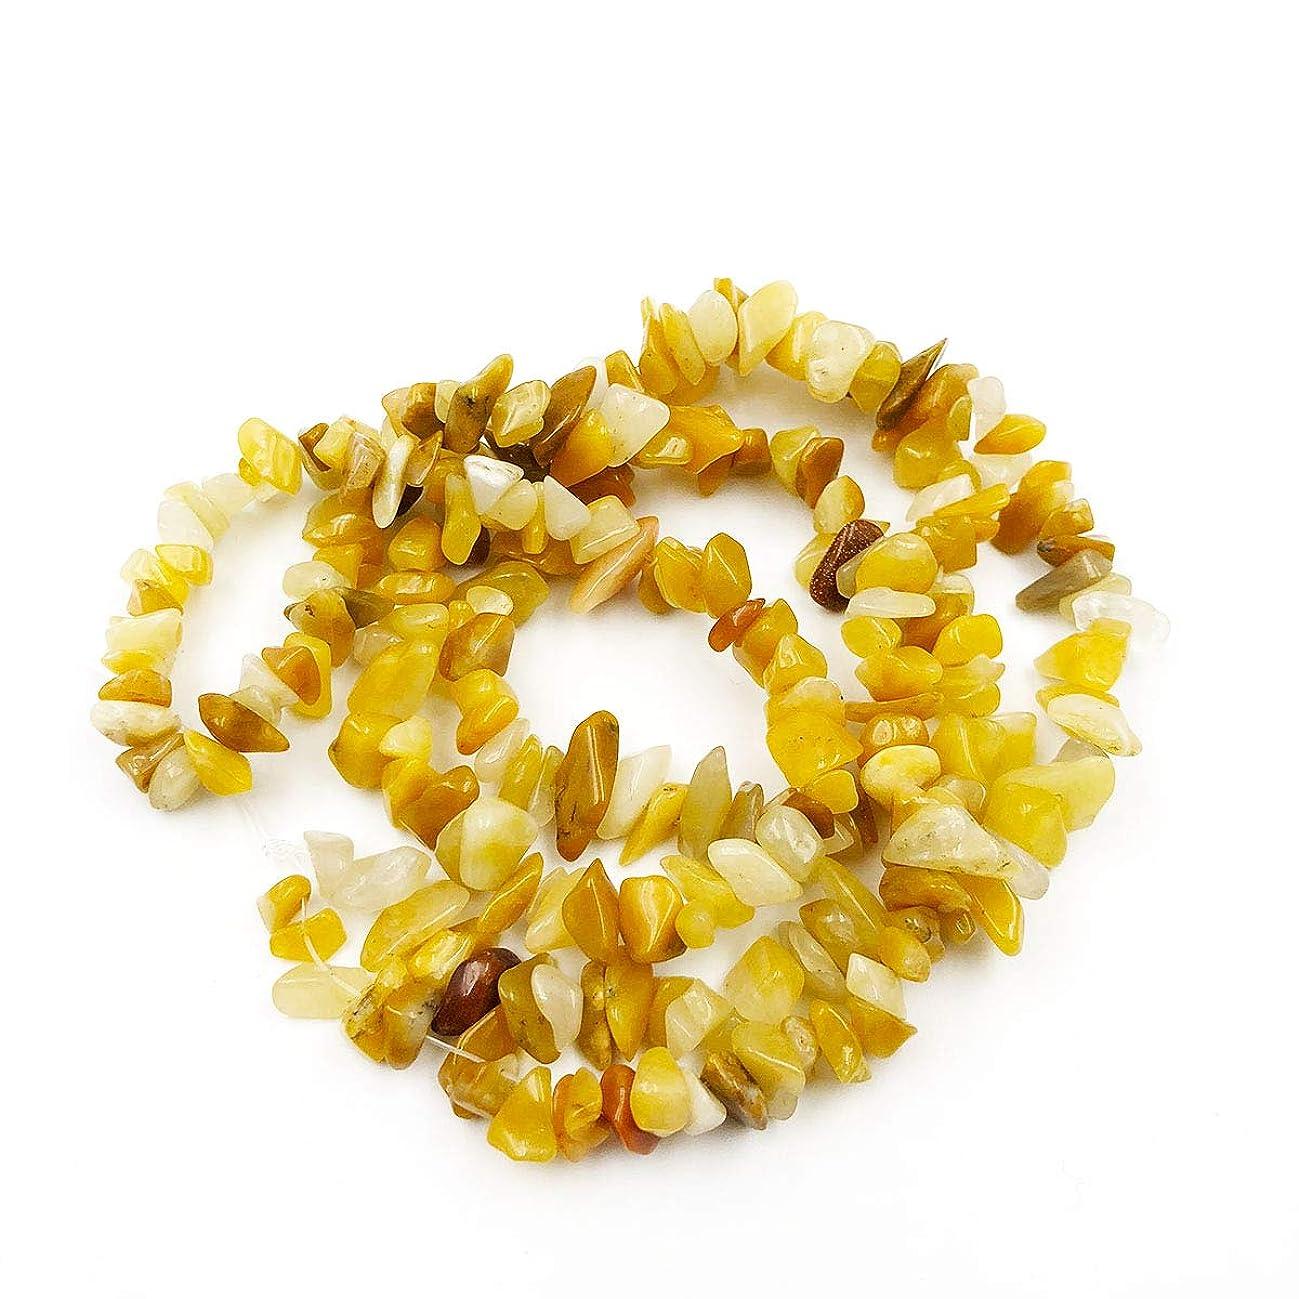 favoramulet Gobi Jade Irregular Tumbled Chips Loose Beads Strand for Jewelry Making